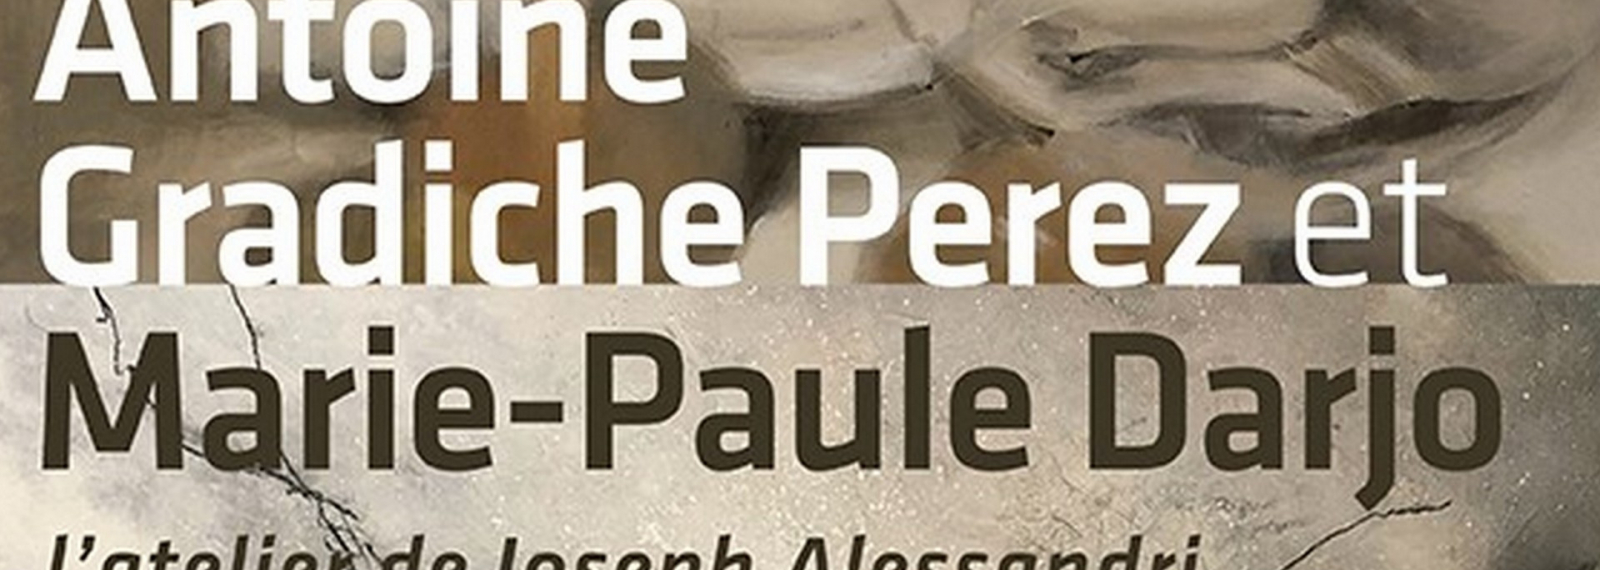 Exposition : Antoine Gradiche Perez et Marie-Paule Darjo